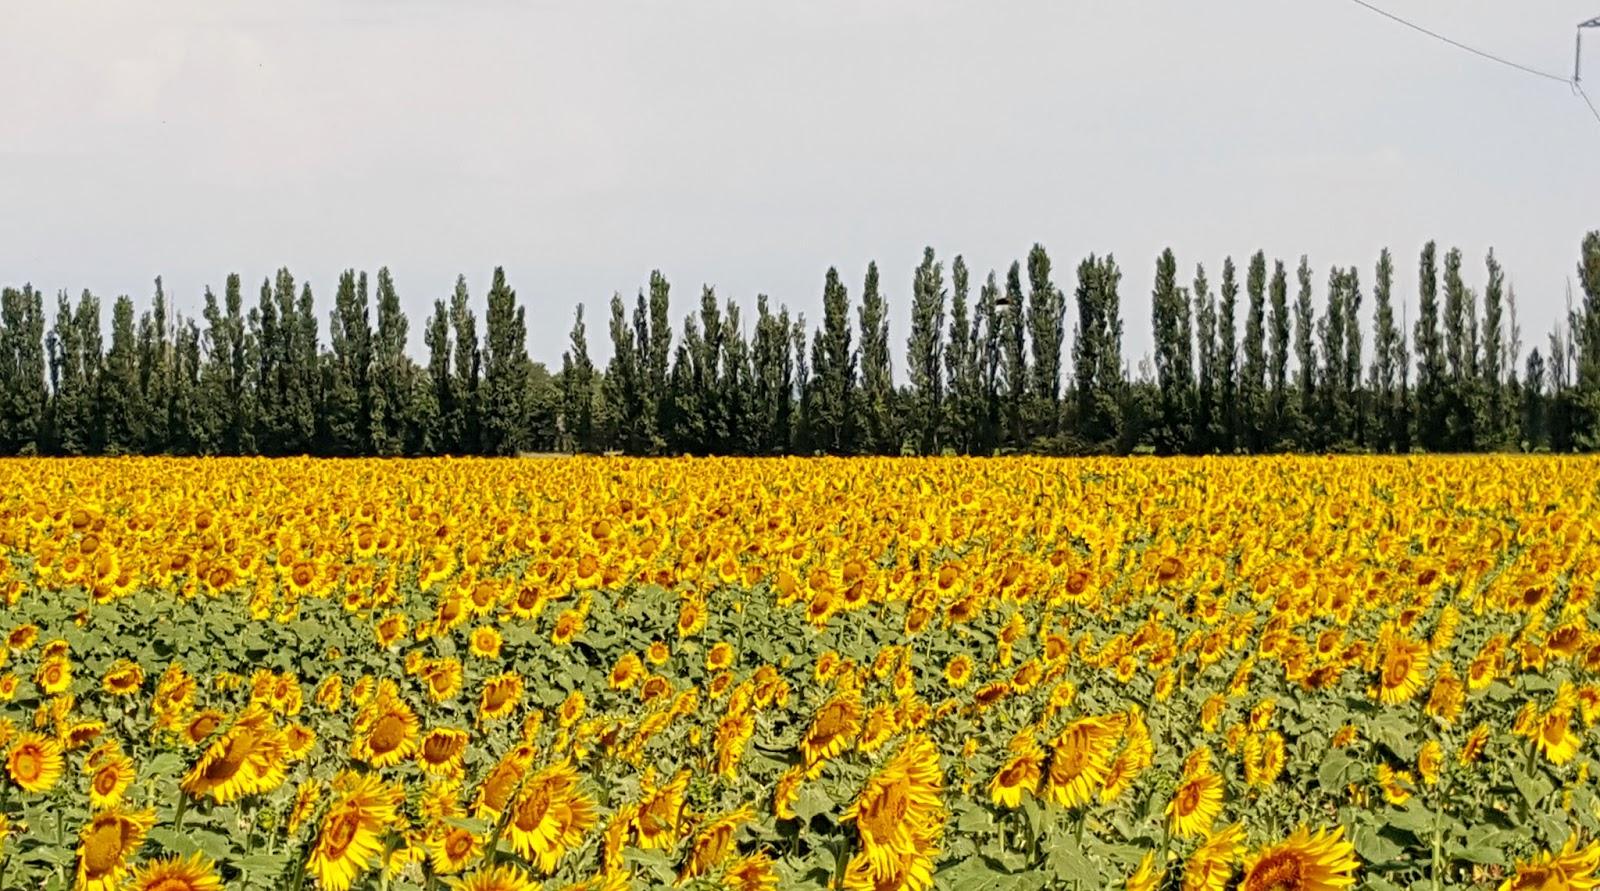 sunflower fields 2 by - photo #40